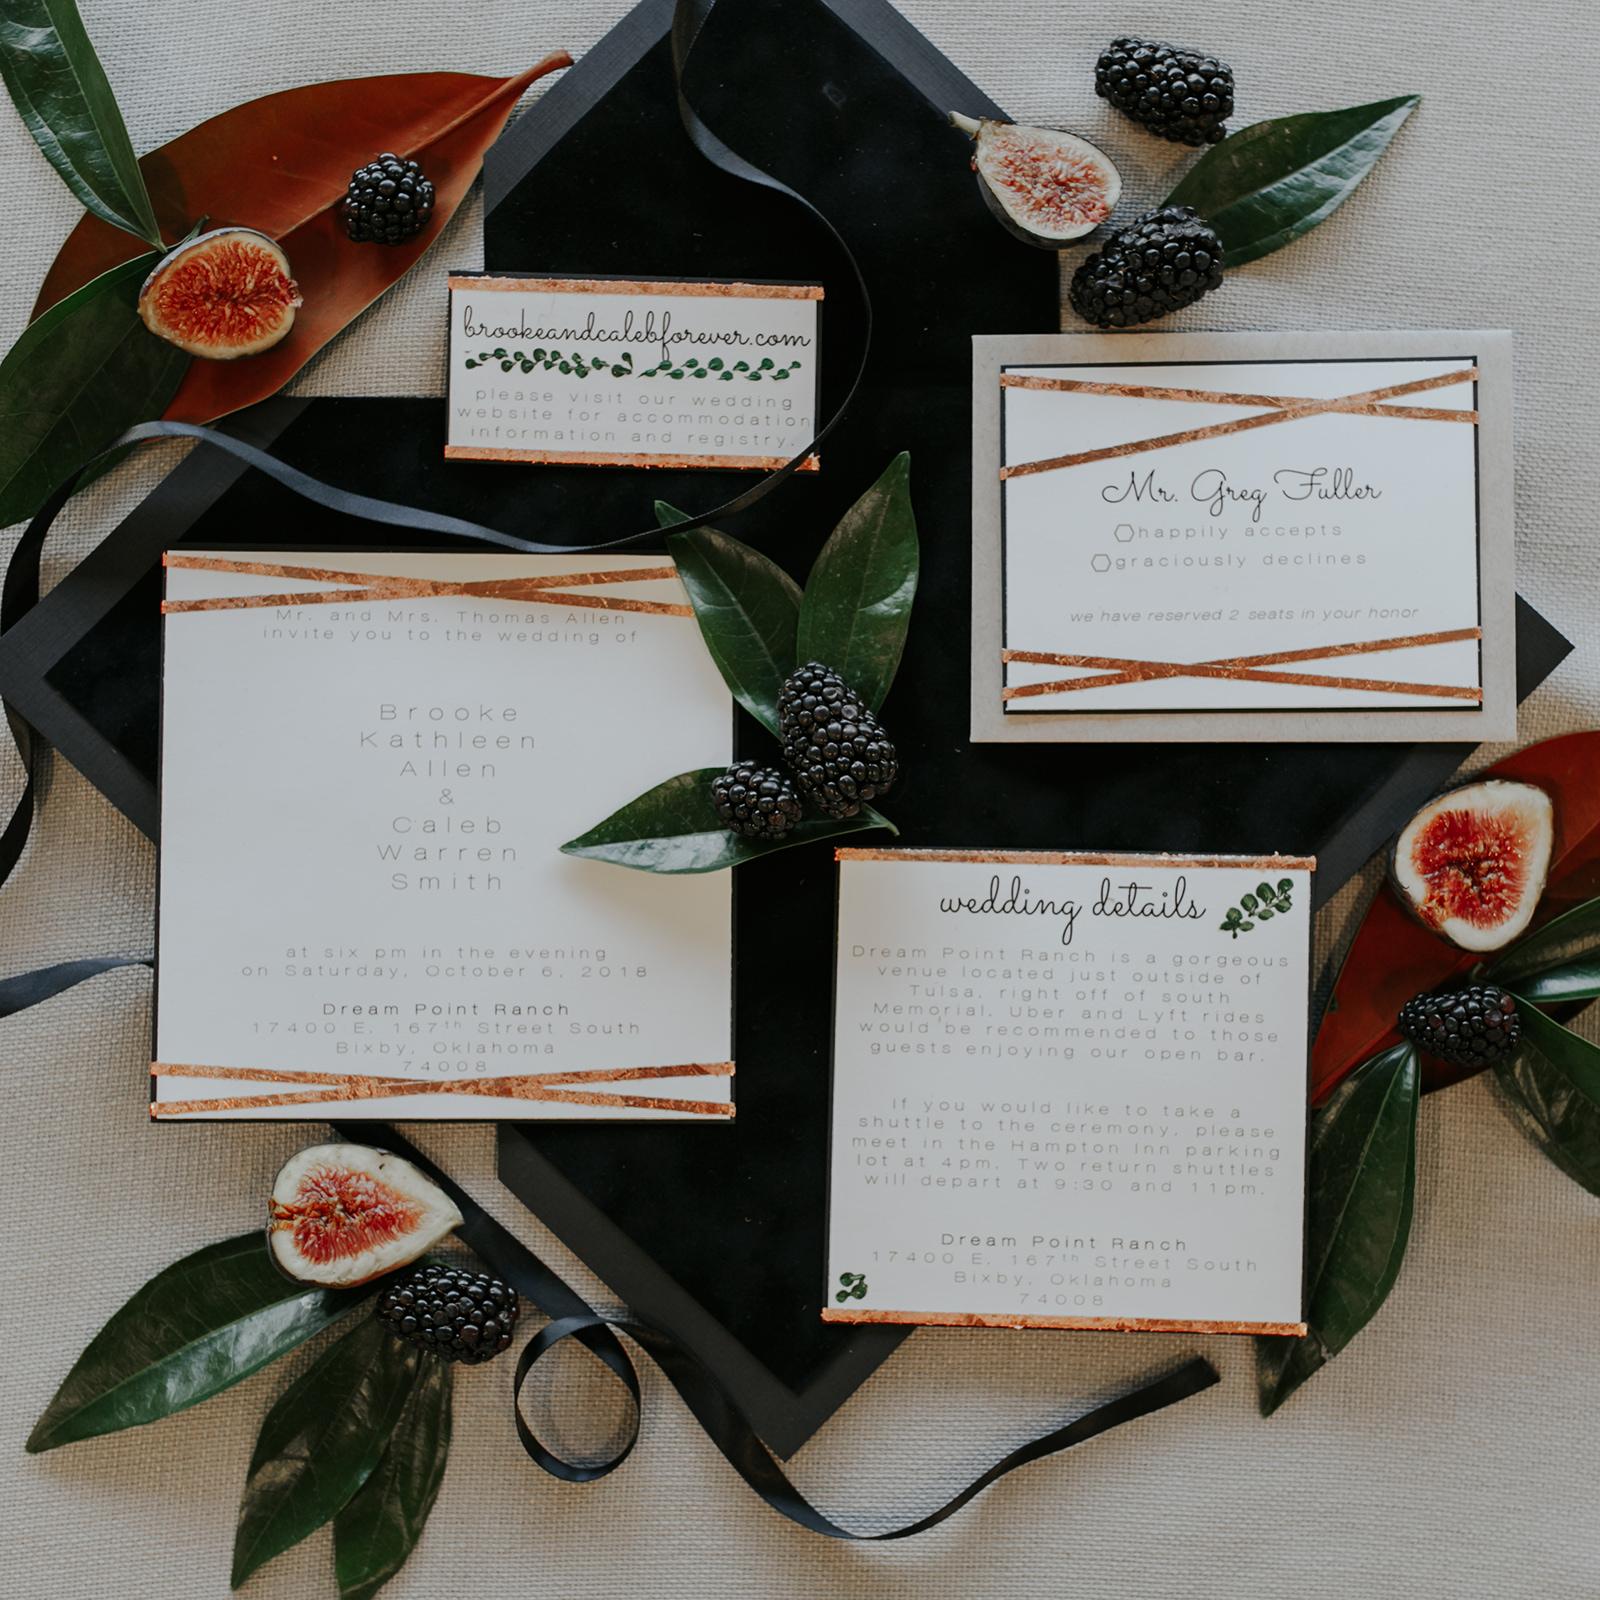 Something Blue Journal Dream Point Ranch Tulsa Wedding Venue -1.jpg